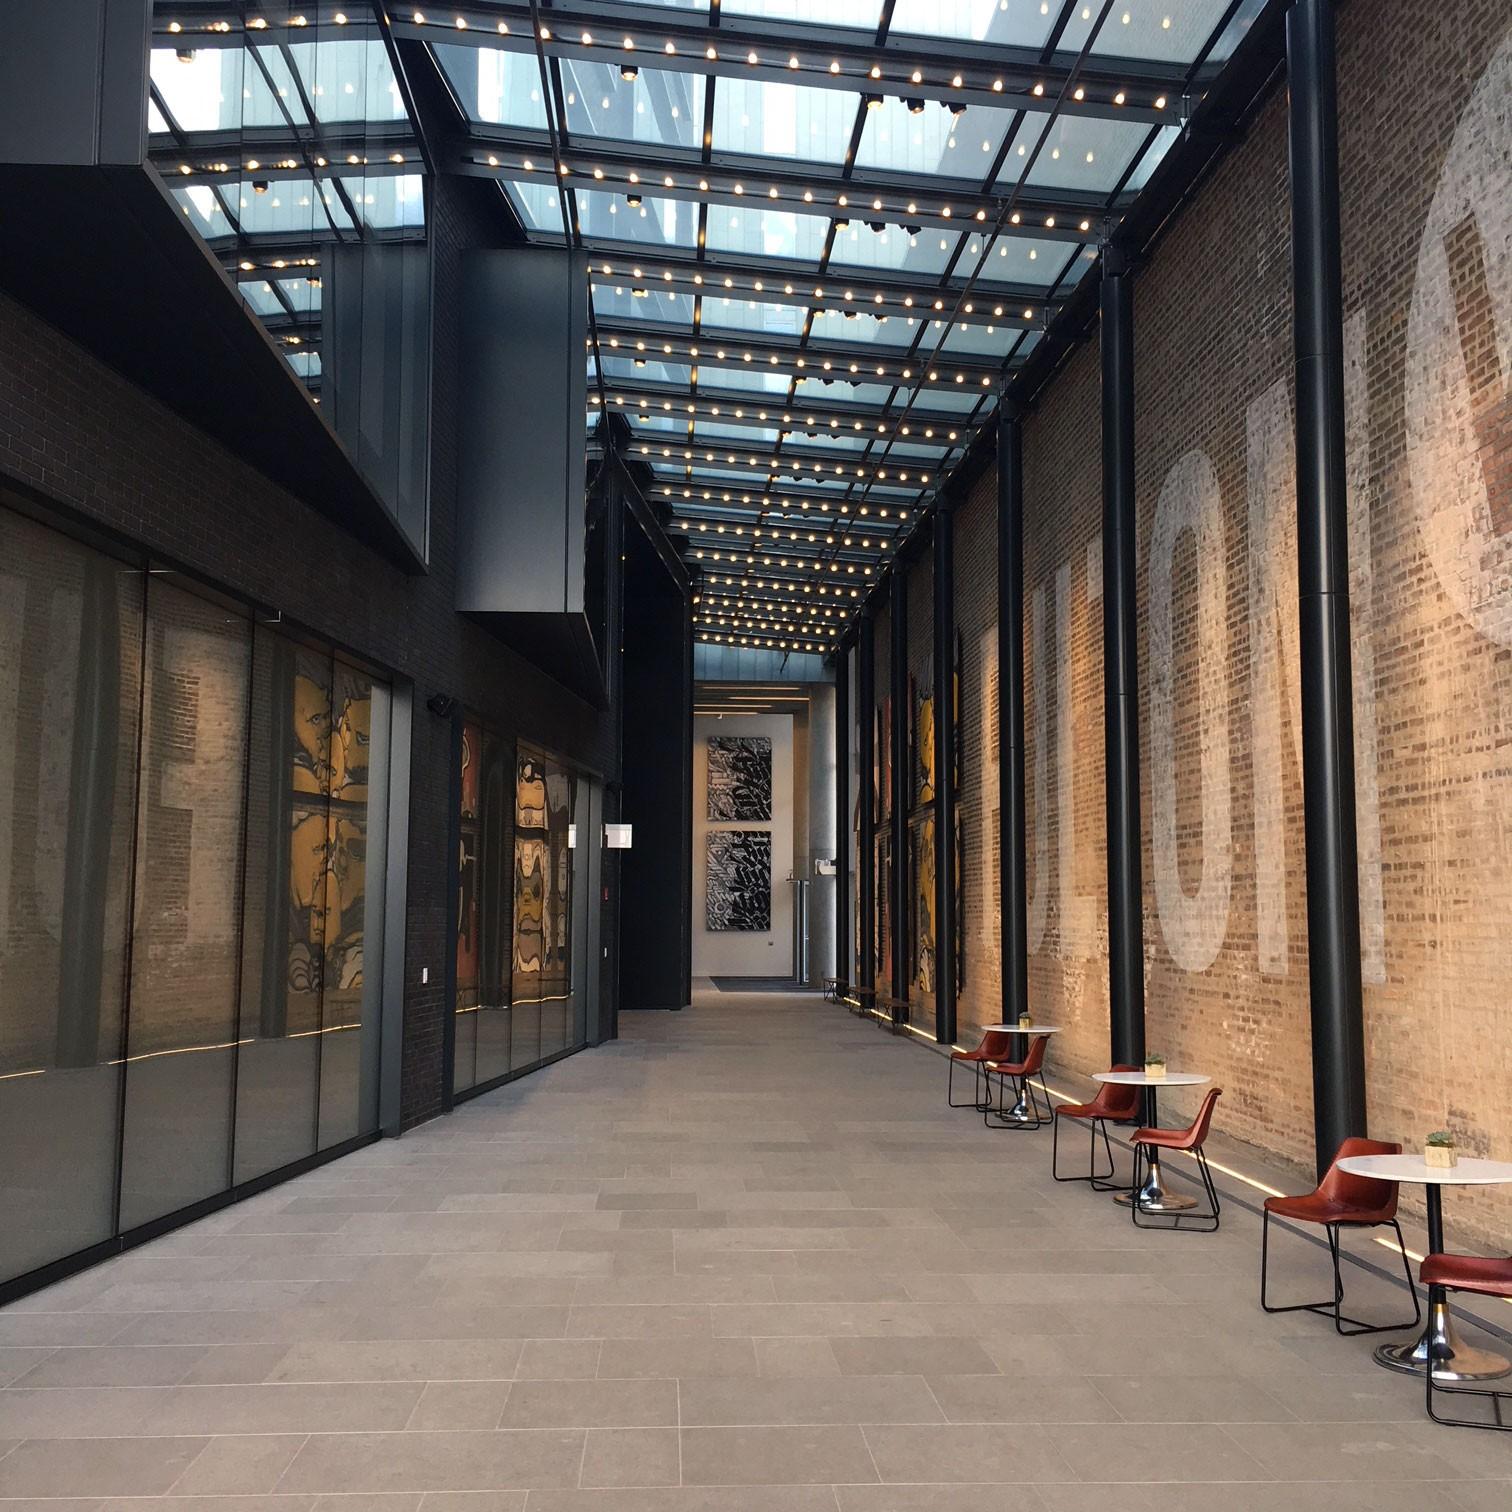 emerging chicago tours chicago architecture foundation caf. Black Bedroom Furniture Sets. Home Design Ideas